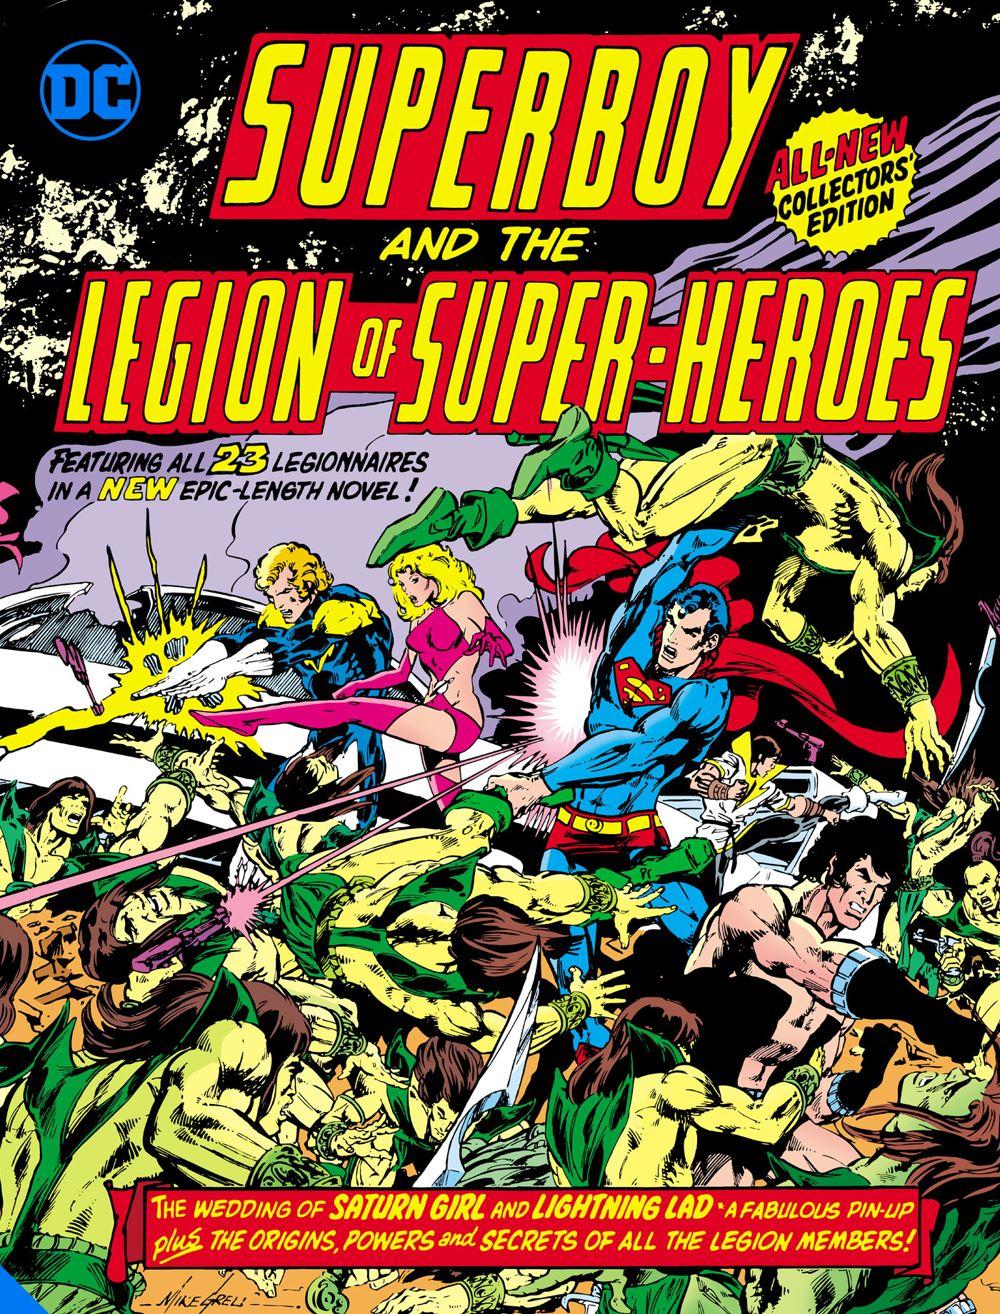 superboyandthelegionofsuperheroestabloid_adv DC Comics July 2021 Solicitations